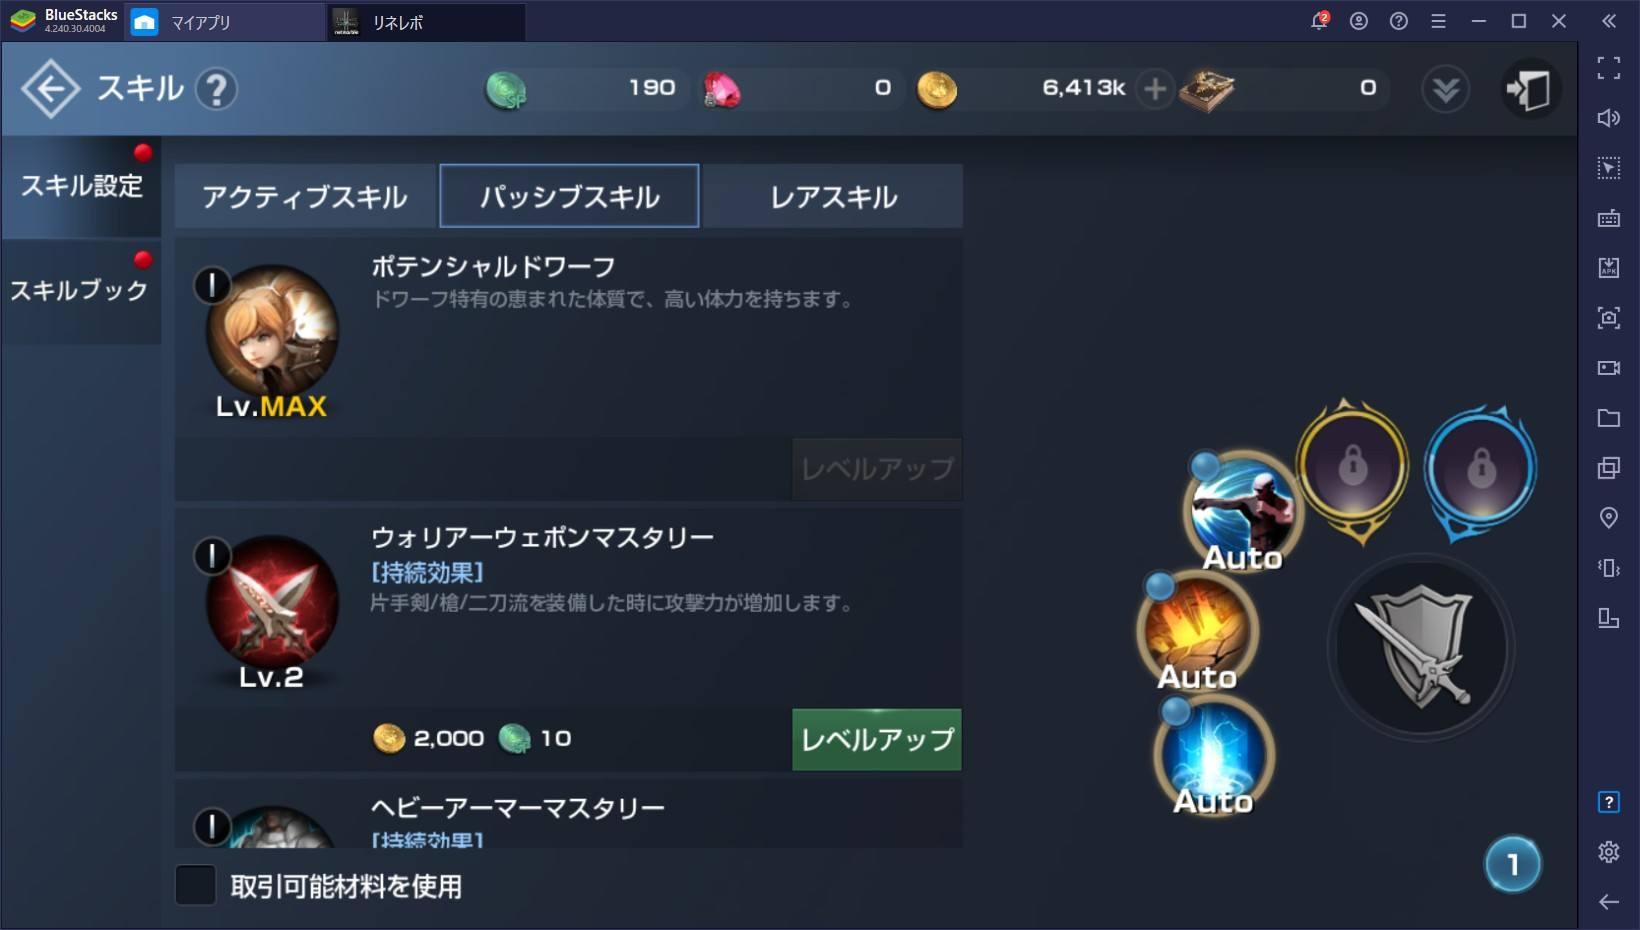 BlueStacks:『リネージュ2 レボリューション』初心者向け攻略ガイド